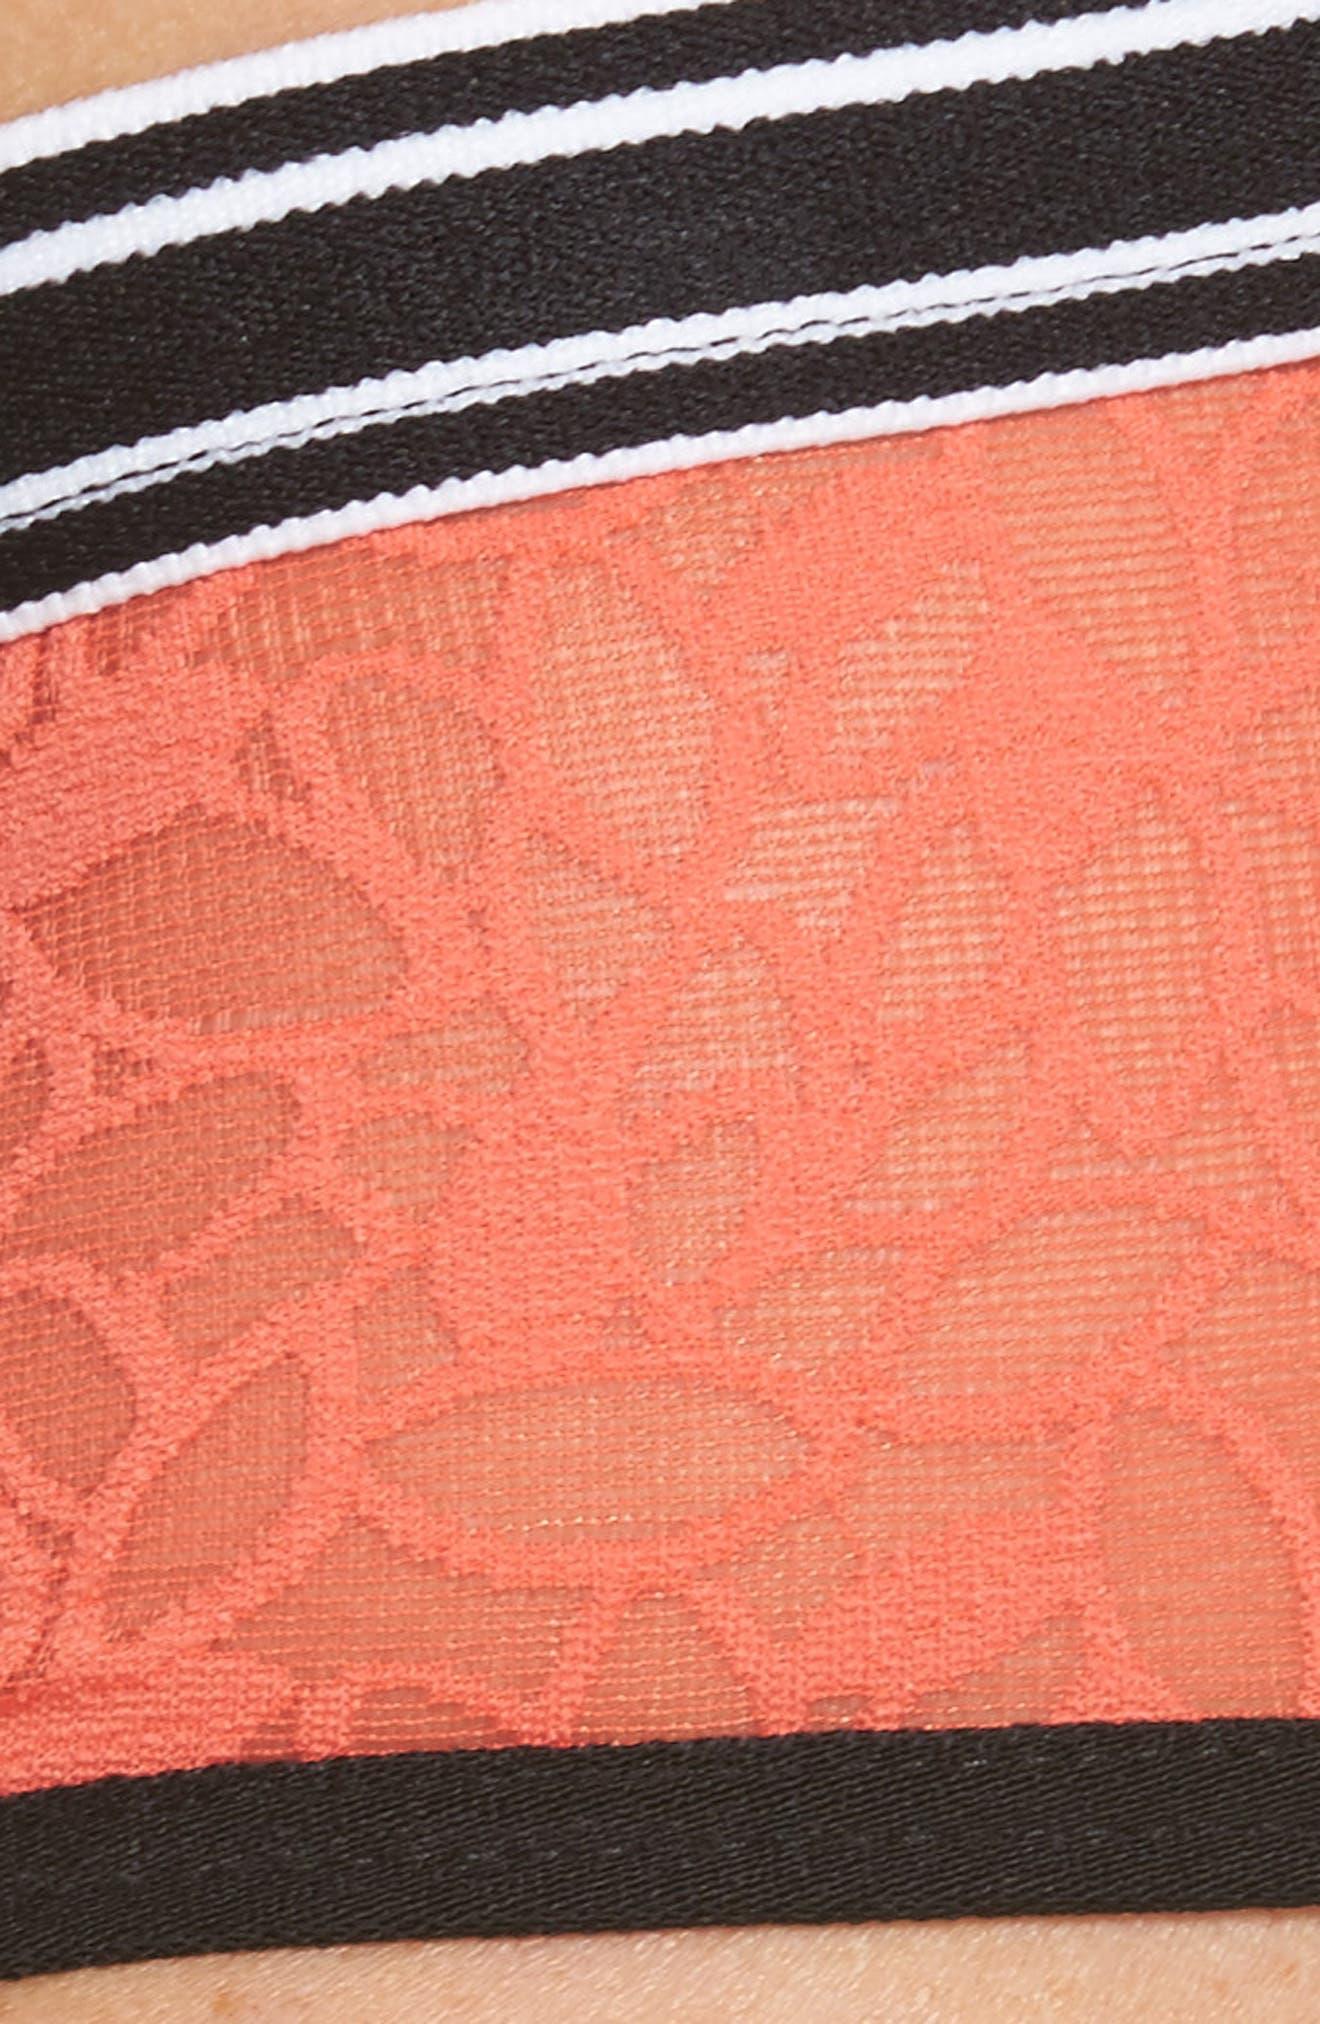 Lori Lace Hipster Panties,                             Alternate thumbnail 9, color,                             Coral Hot